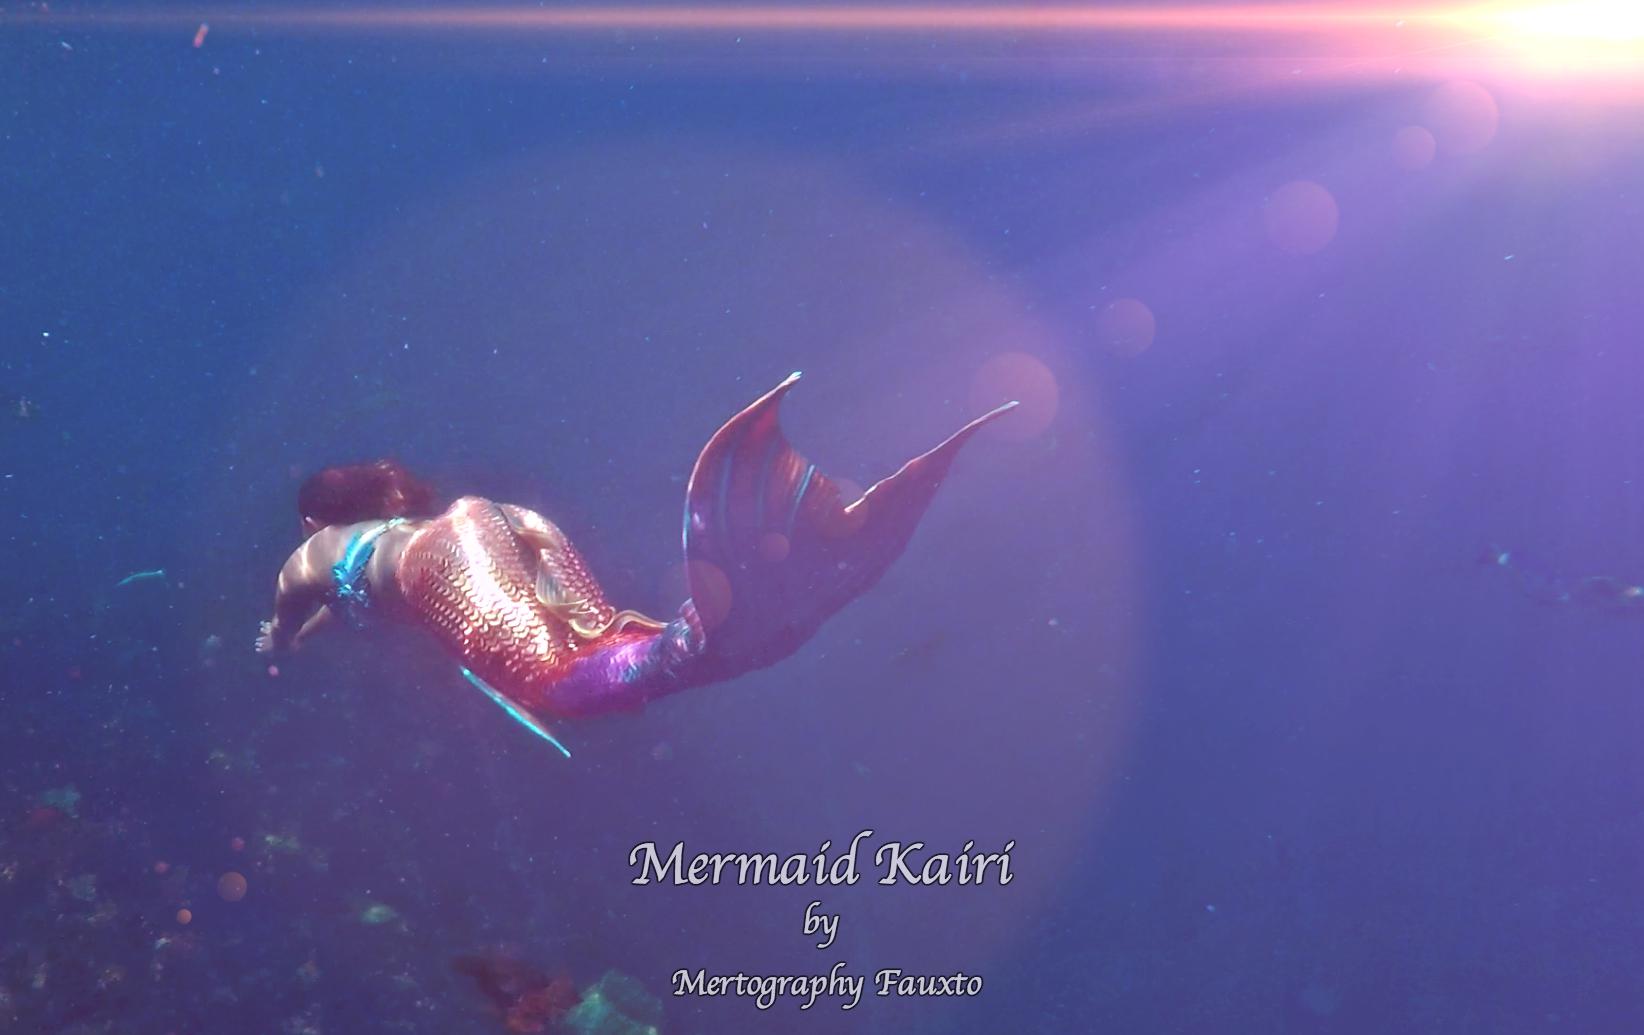 Mertography Ad FB Cover .jpg